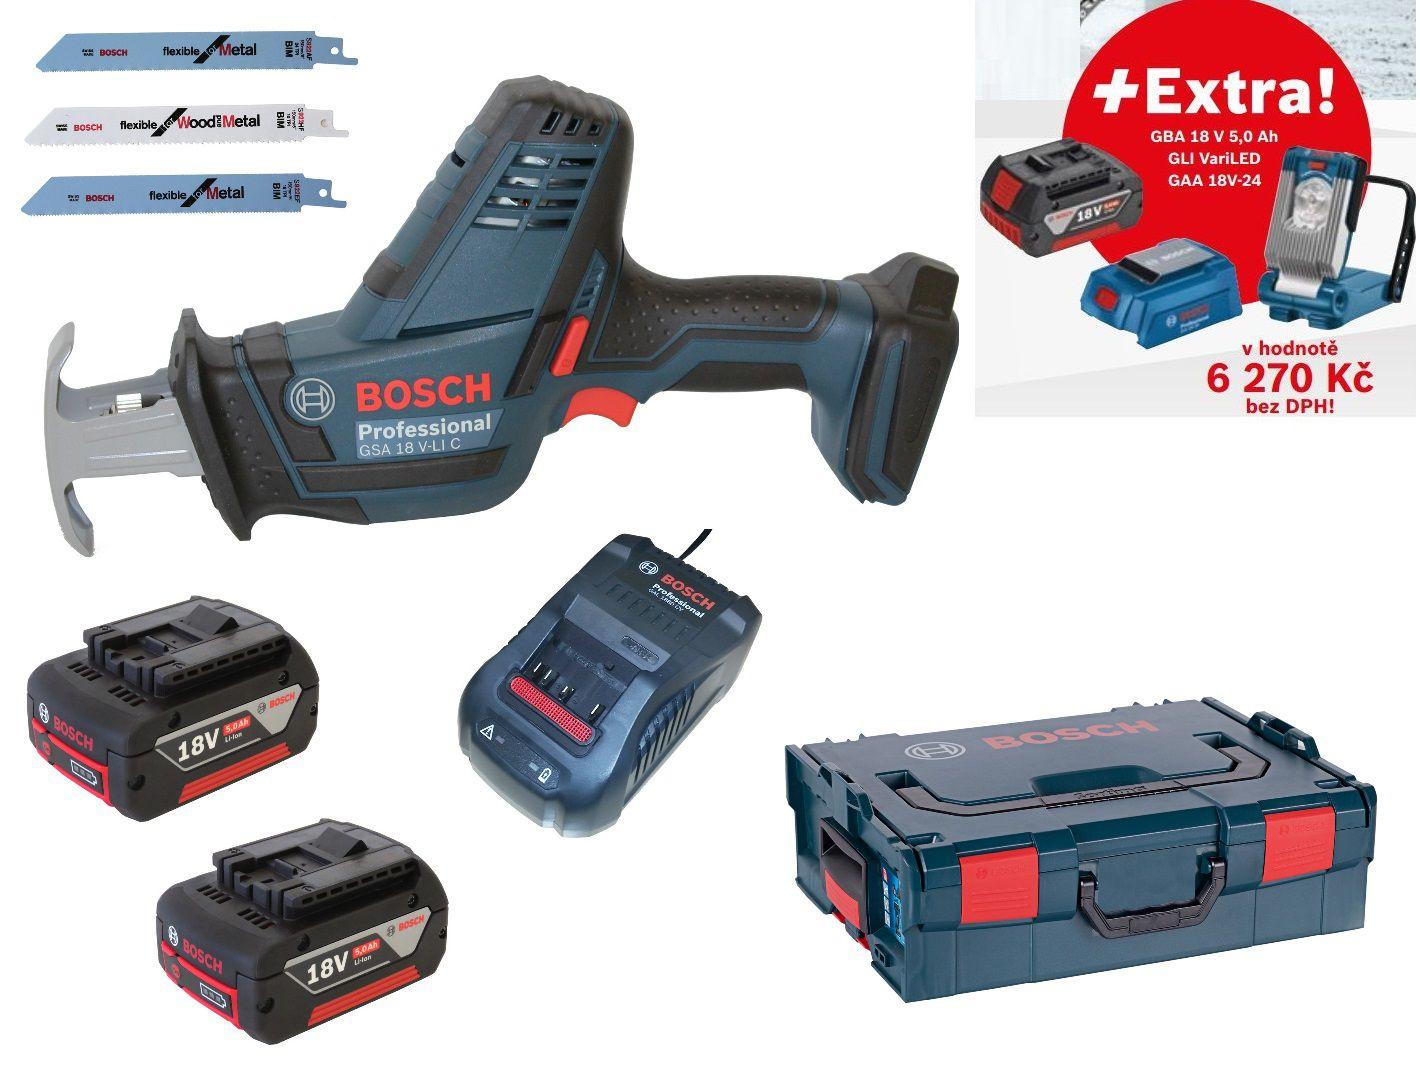 Aku pila ocaska Bosch GSA 18 V-LI C Professional - 2x aku 18V/5.0Ah + extra 1x aku 5.0Ah + svítilna GLI VariLED + USB adaptér GAA 18V-24, v kufru L-BOXX (06016A5002) Bosch Professional